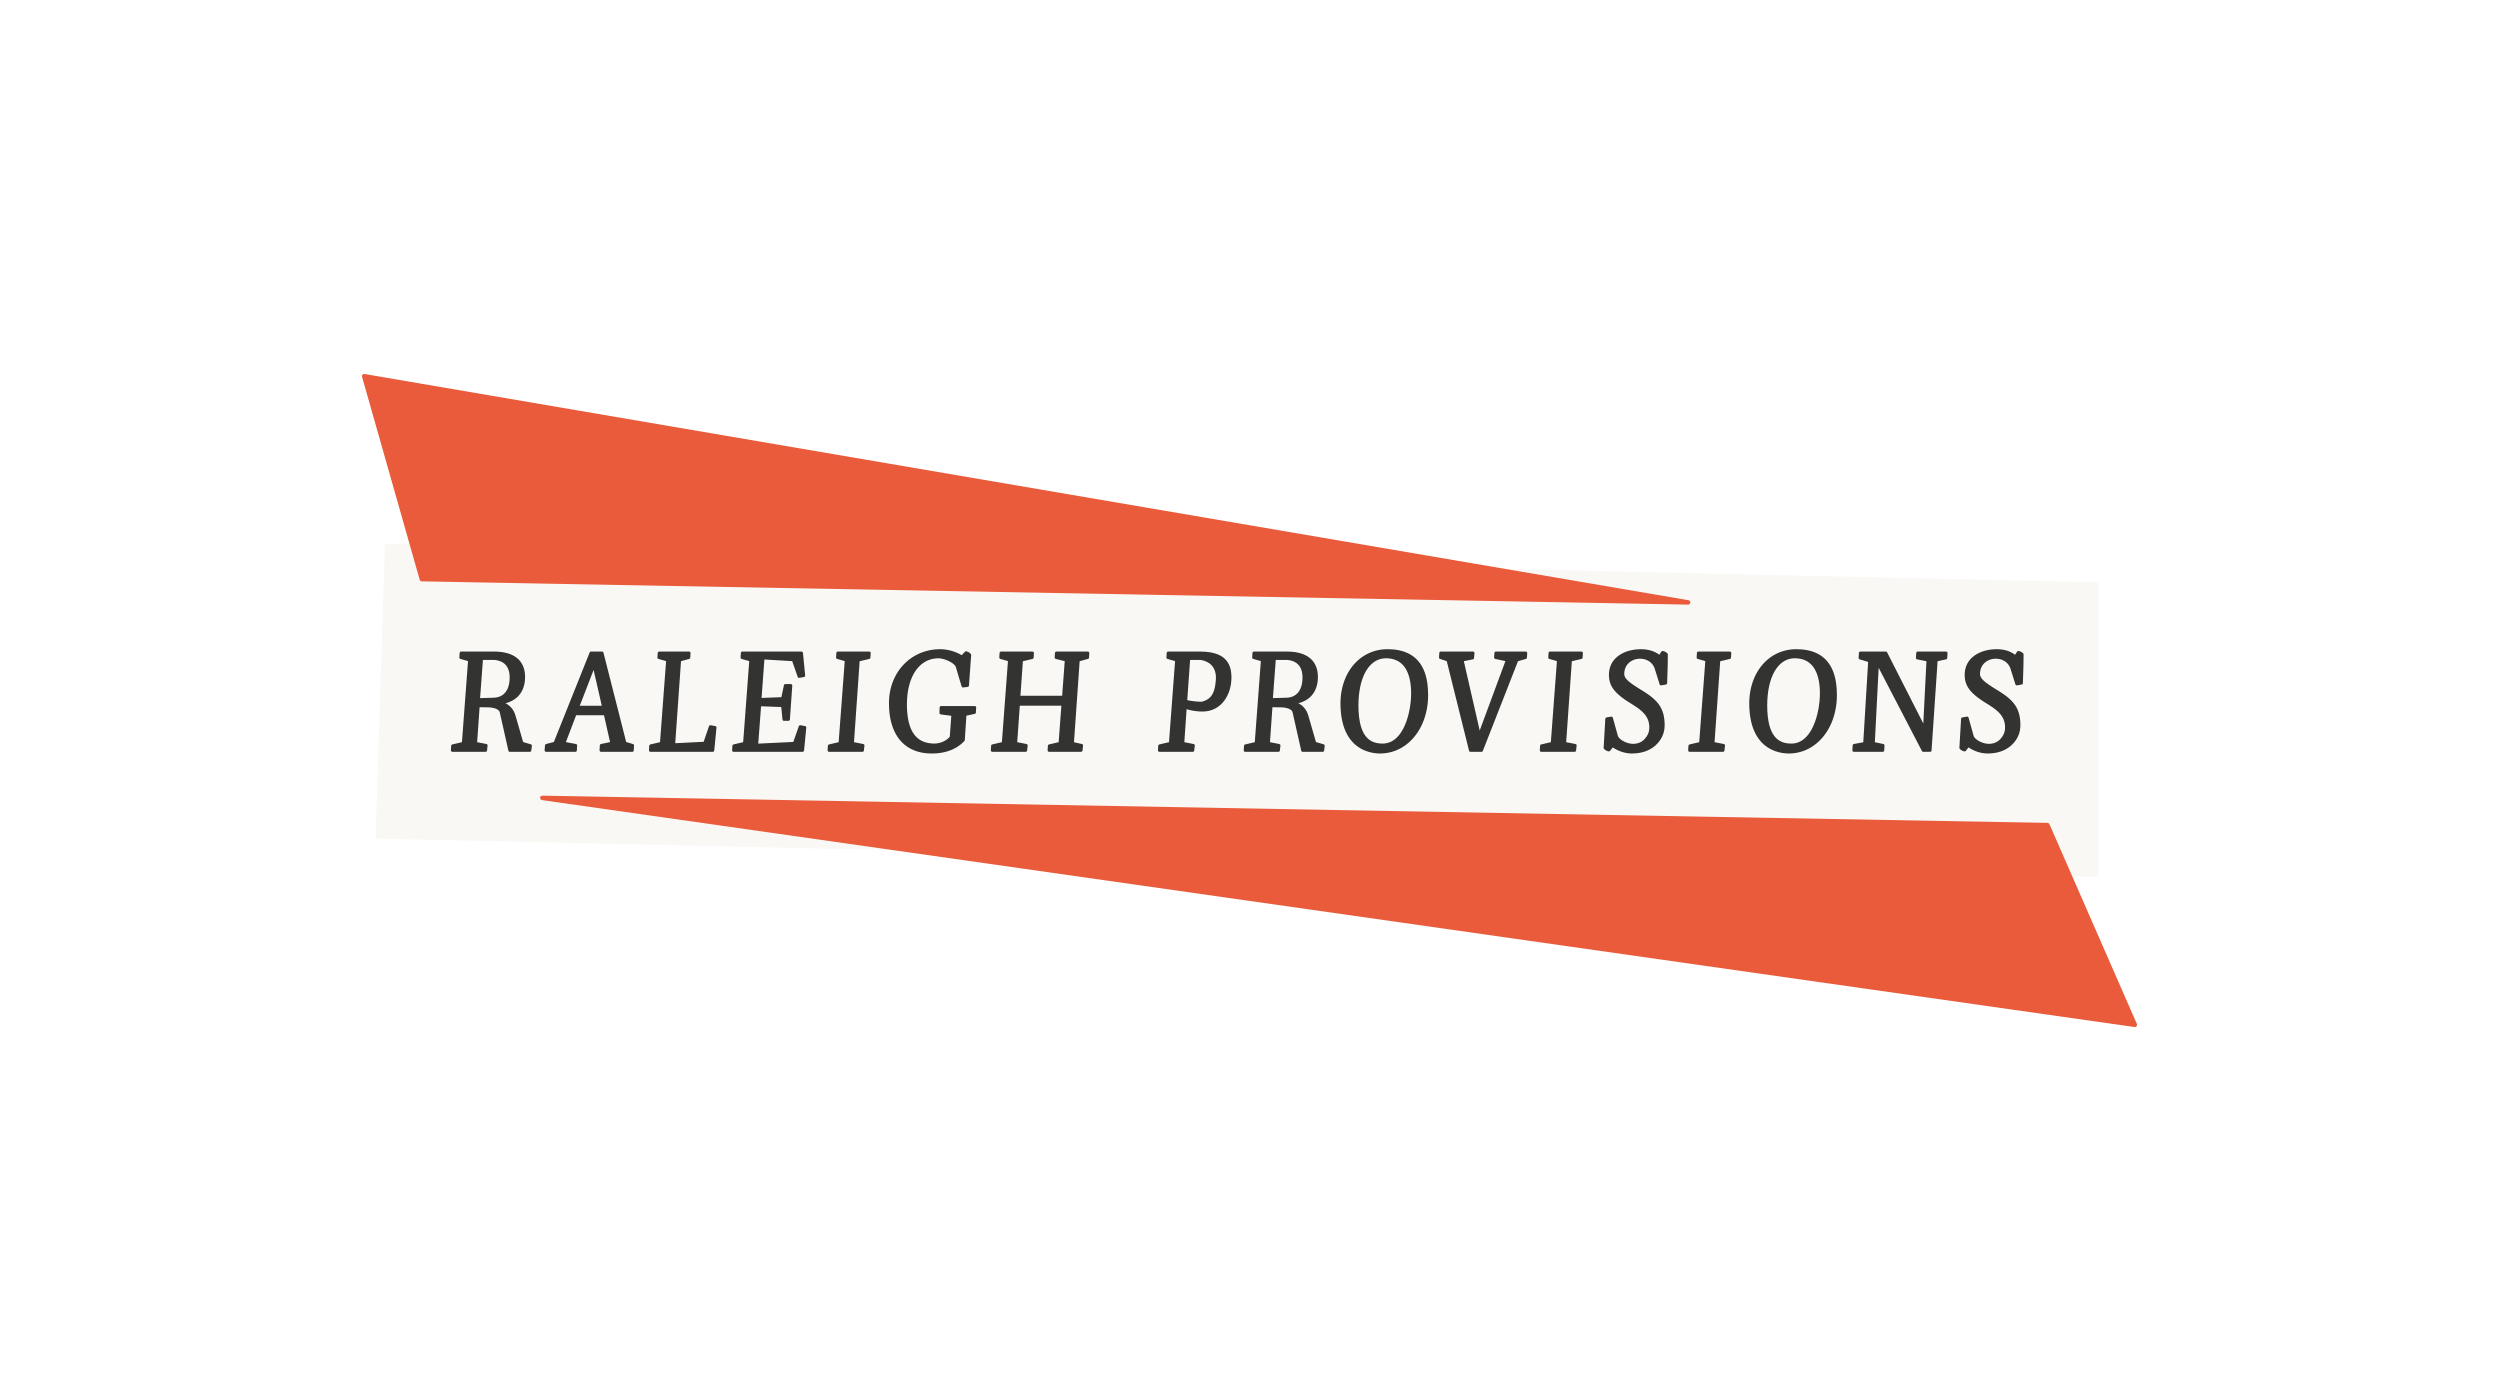 raleigh-provisions-branding-longform.png